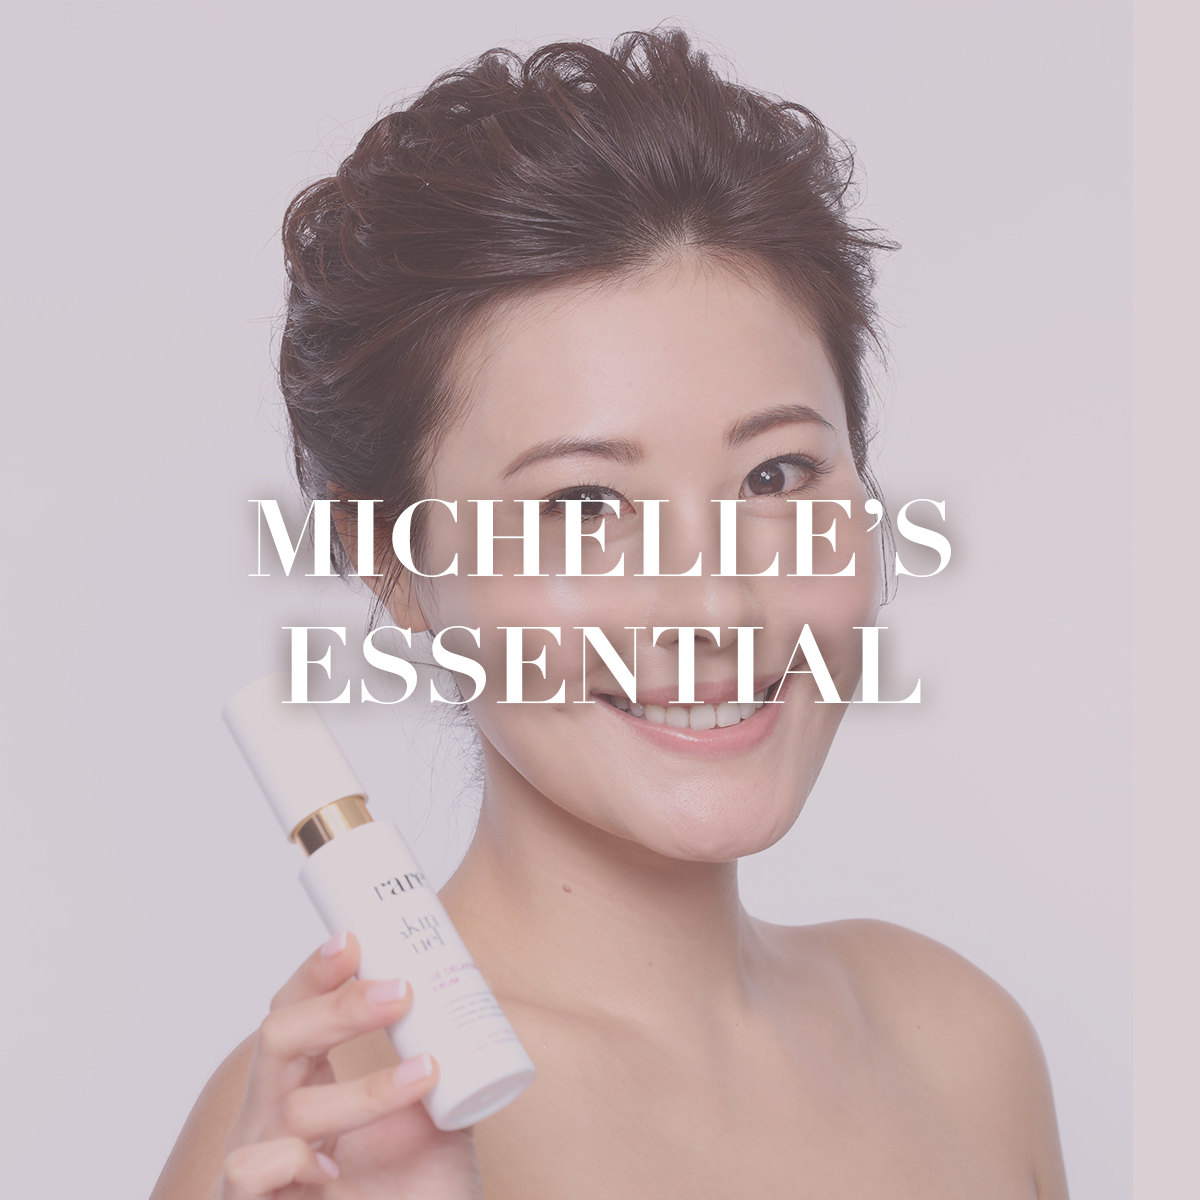 Michelle's Essential-RARE SkinFuel